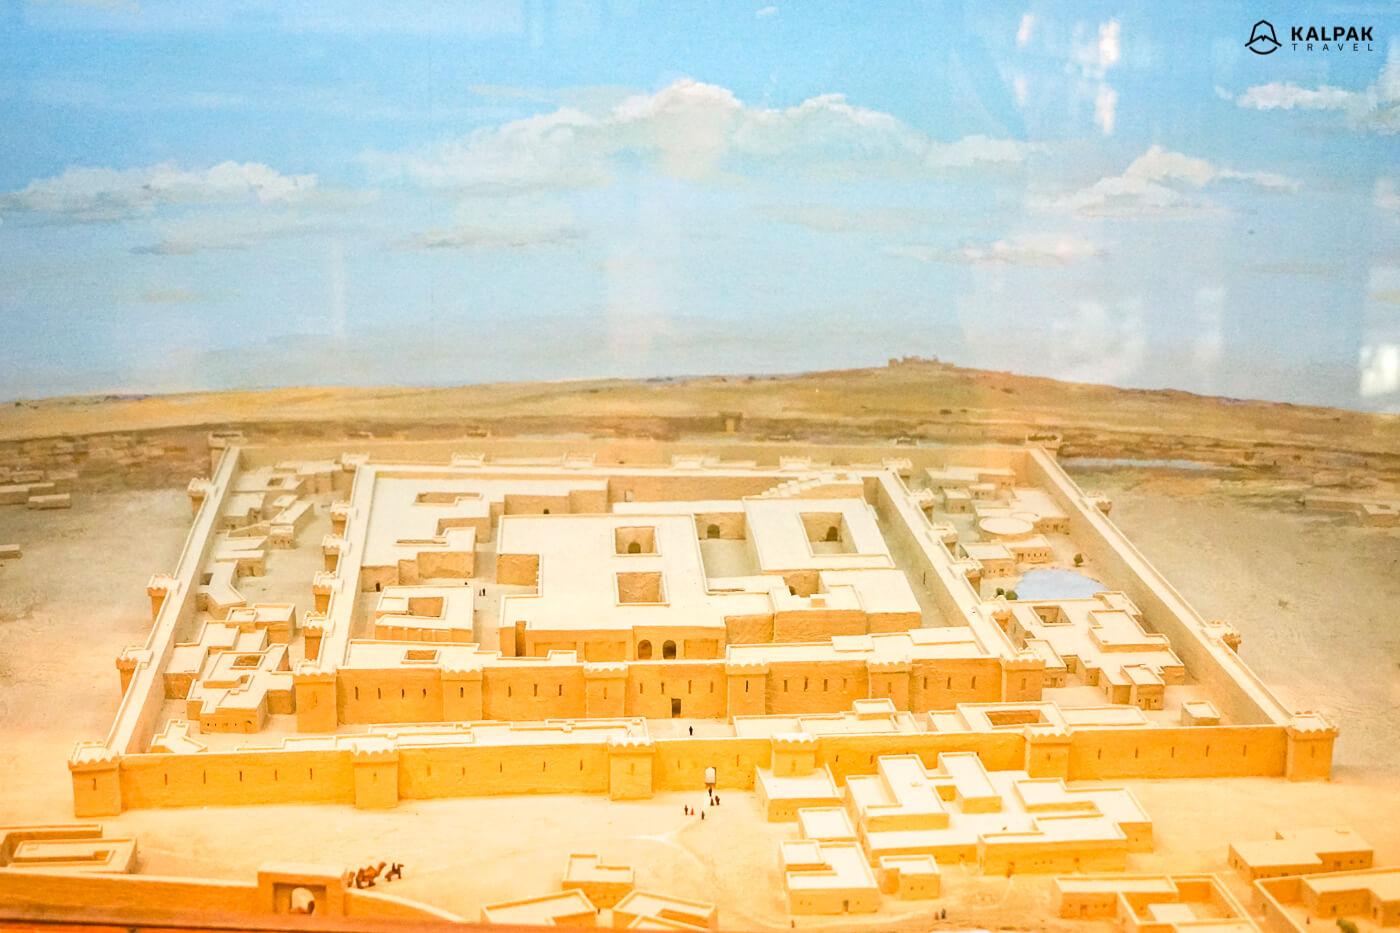 Gonur Depe model of the ruins in Turkmenistan